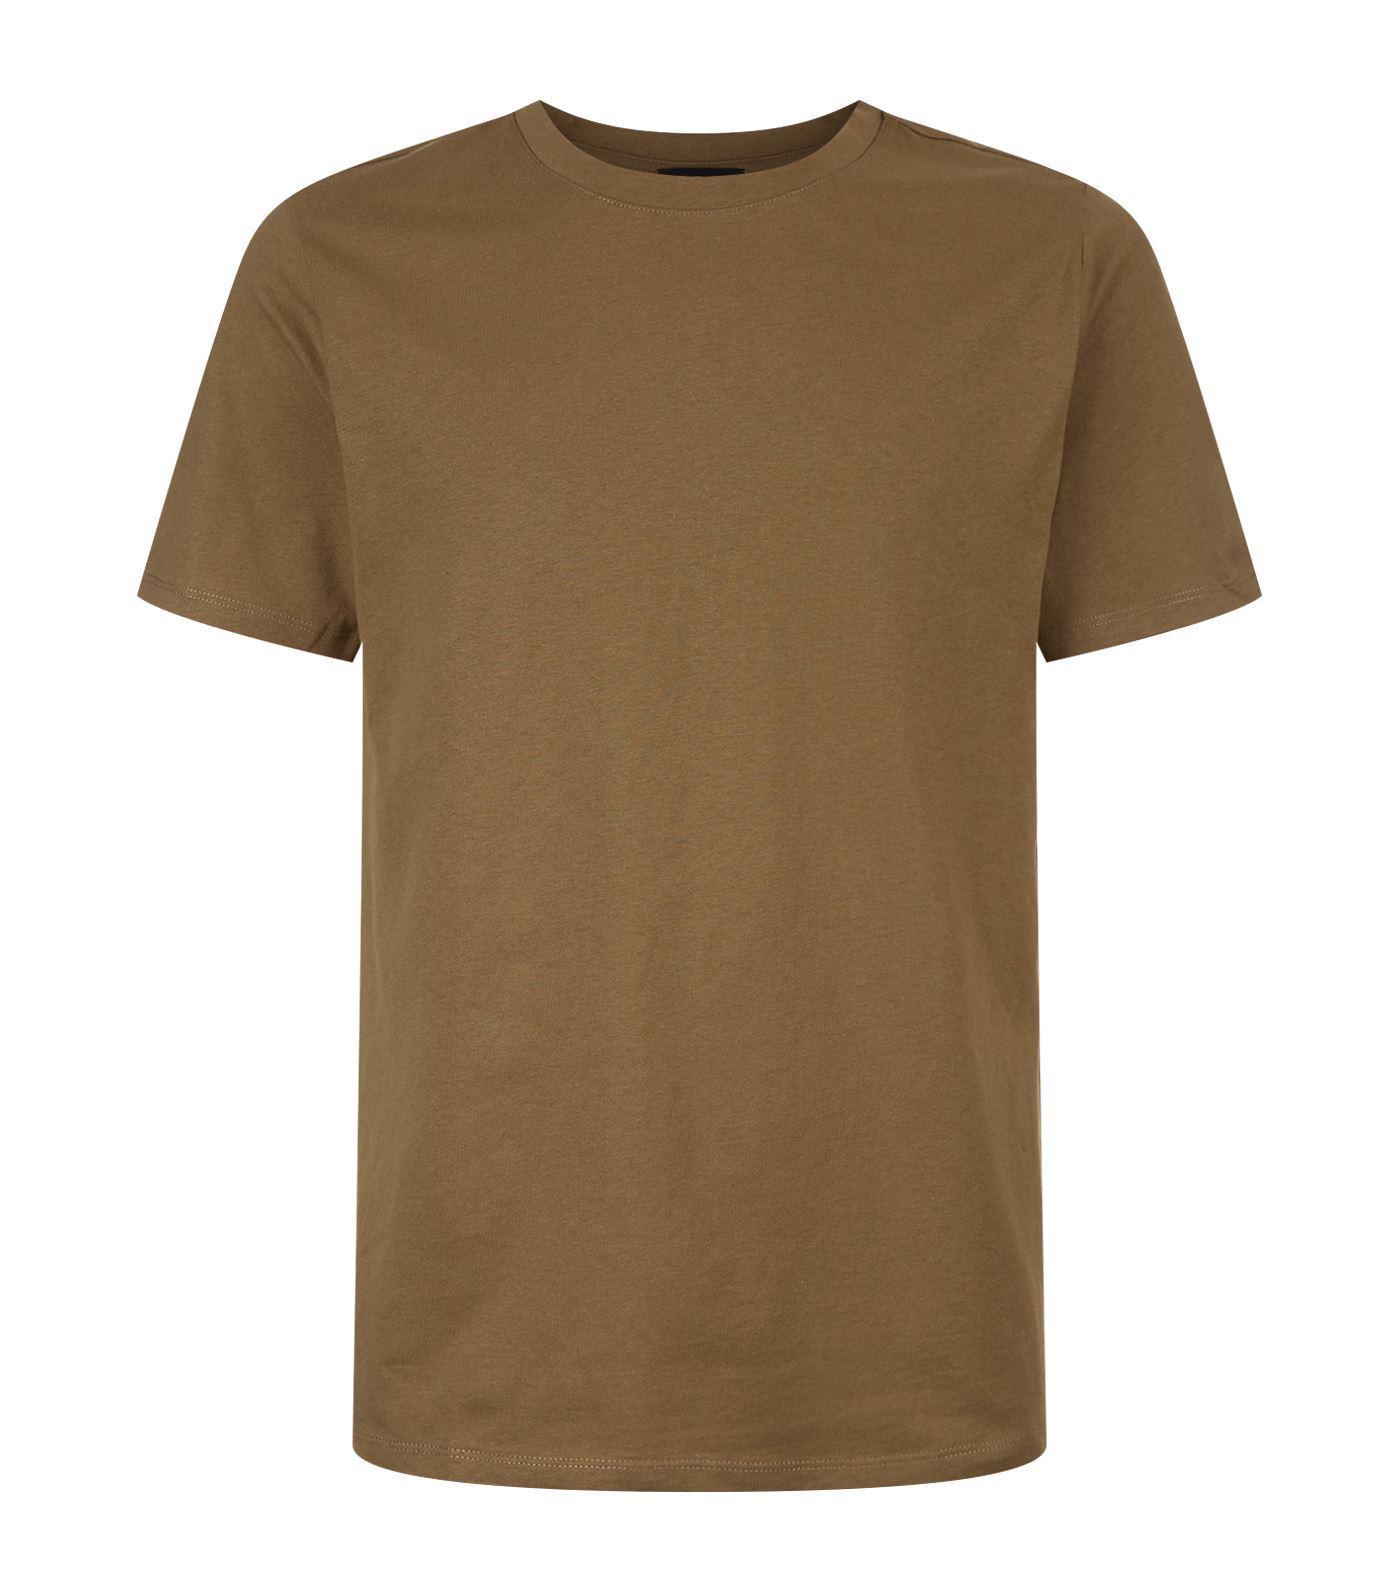 A.P.C. Cotton T-Shirt In Beige